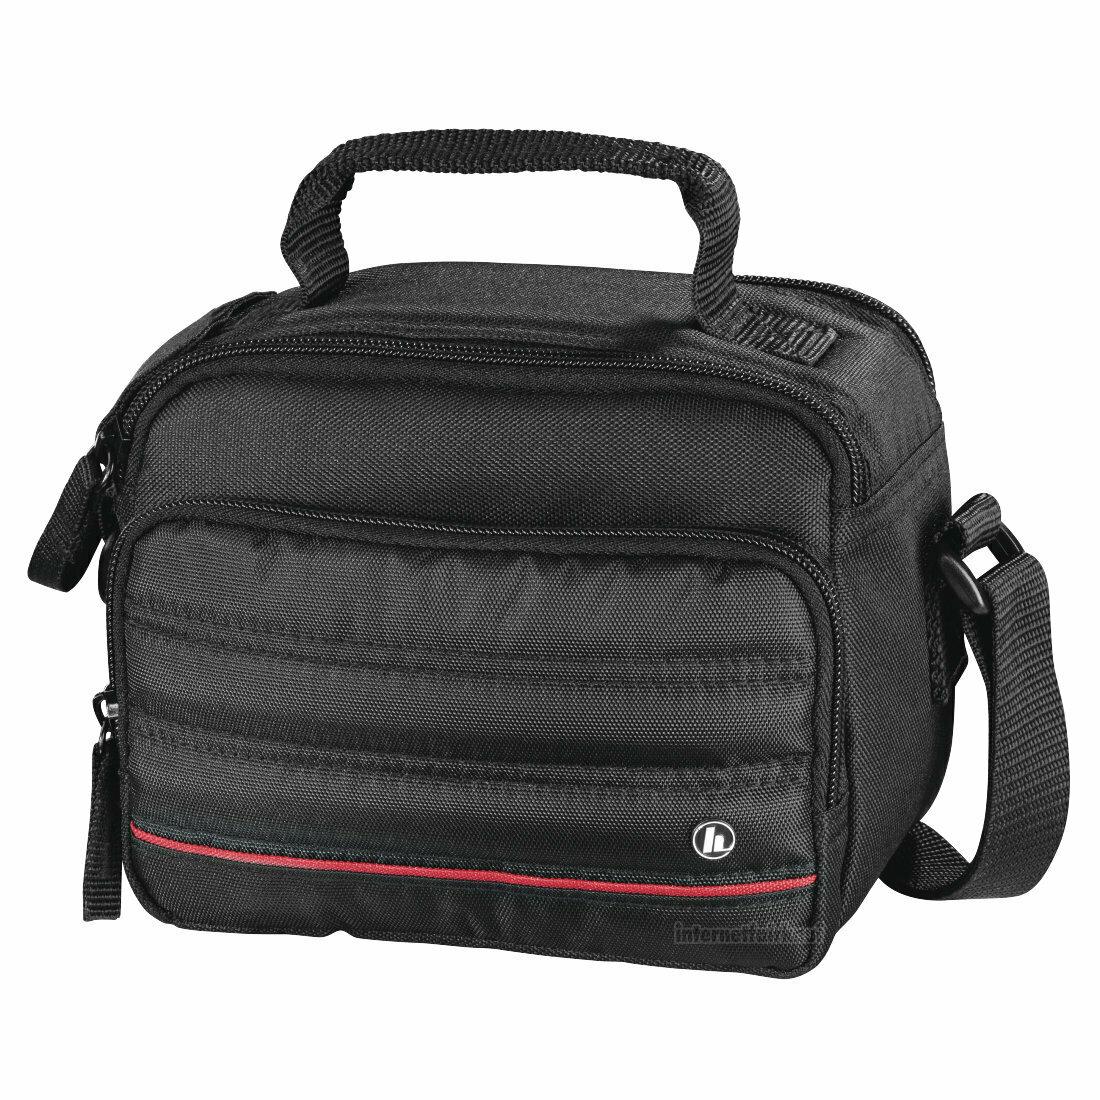 Tasche passend für Sony DCR-SX21E DCR-SX15E DCR-SX45E